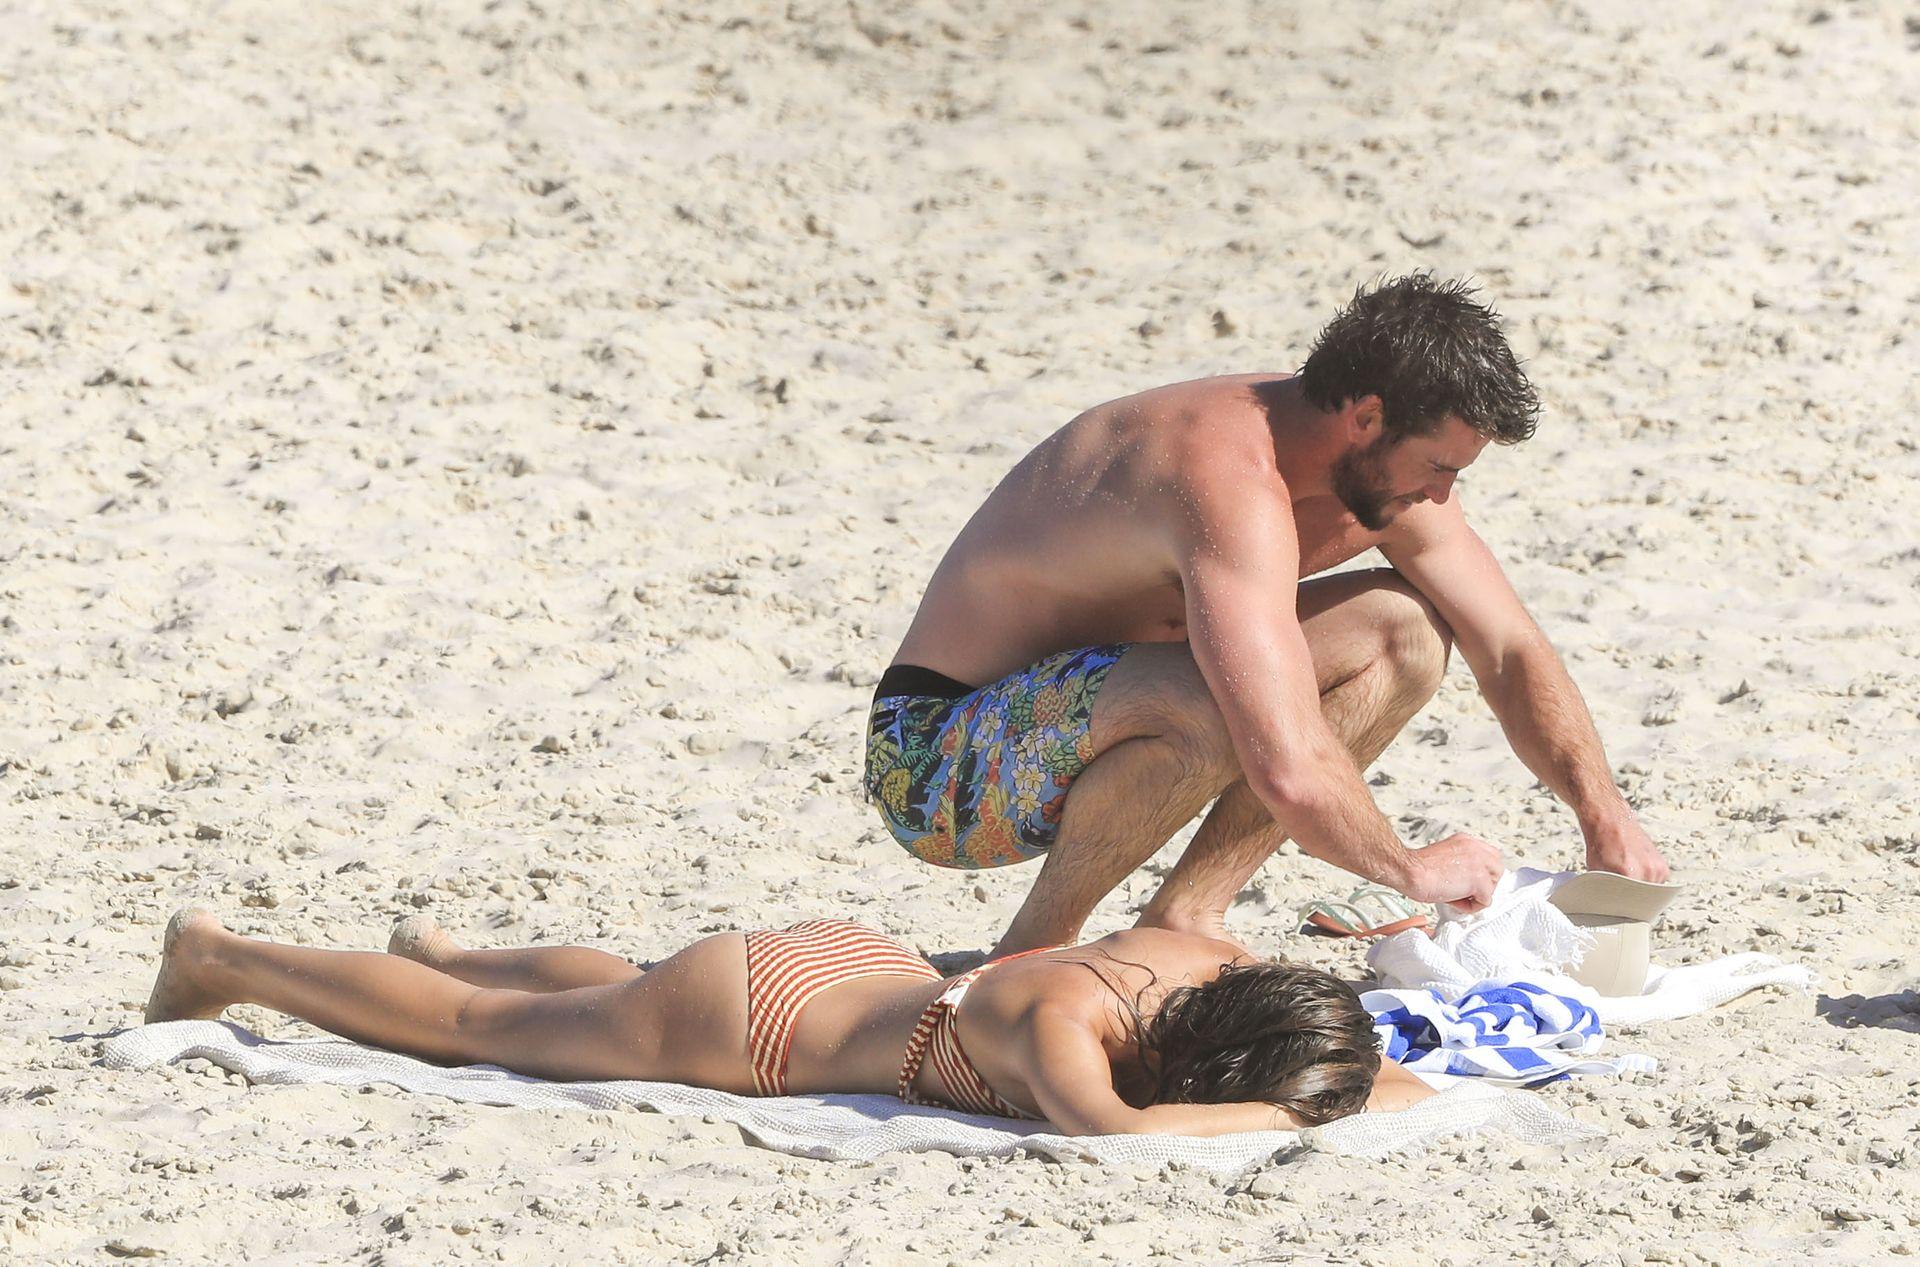 Gabriella Brooks Hot – Liam Hemsworth's New Girlfriend 0033